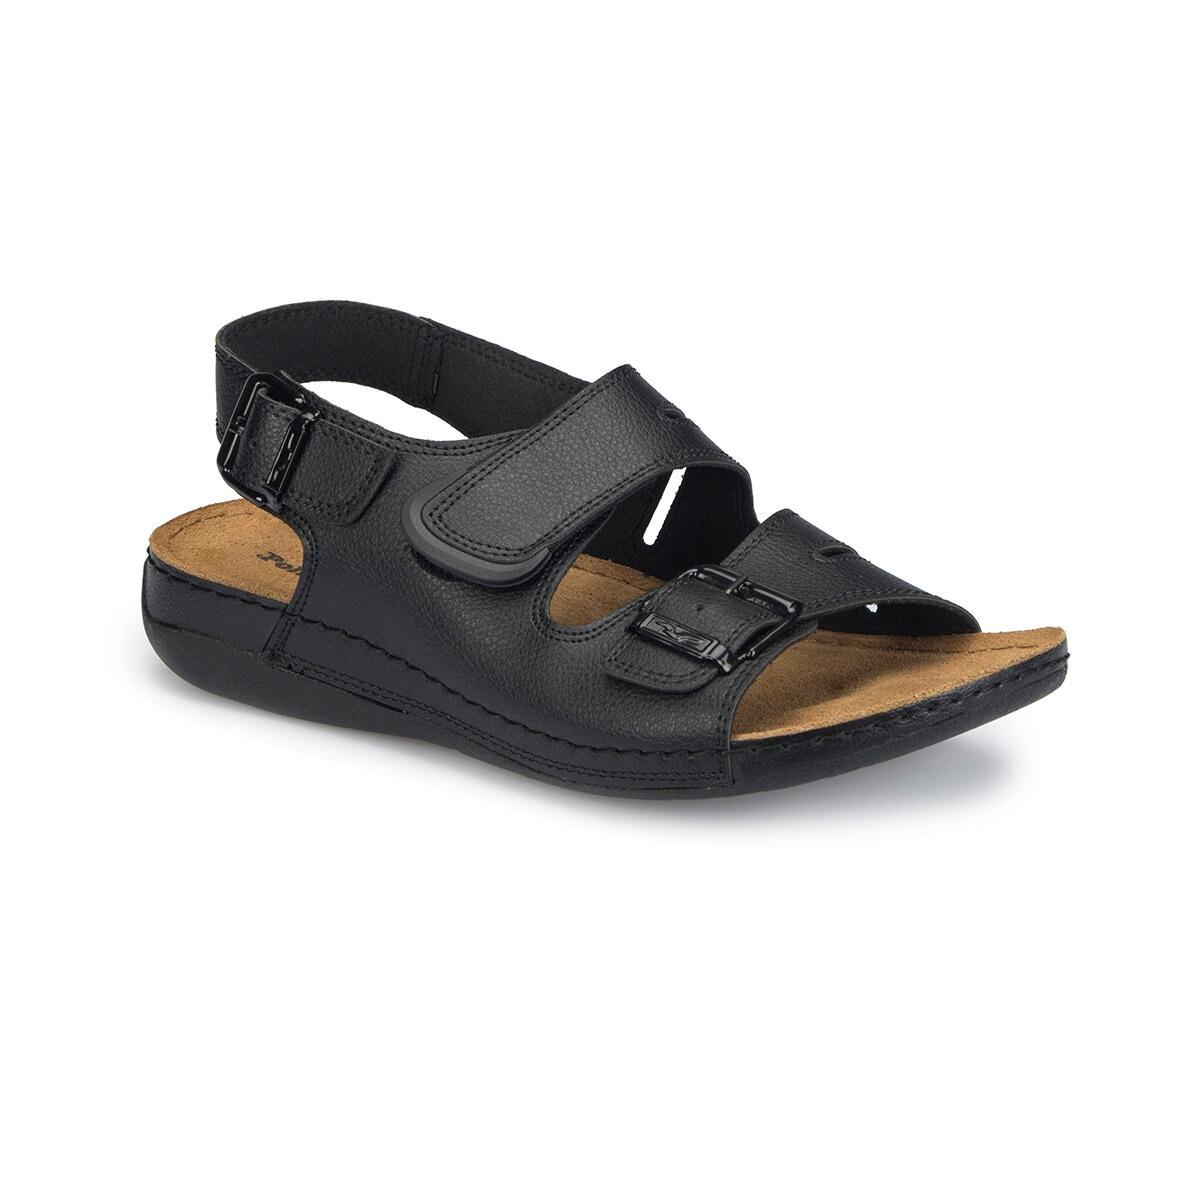 FLO 81.157731.M Black Men 'S Classic Shoes Polaris